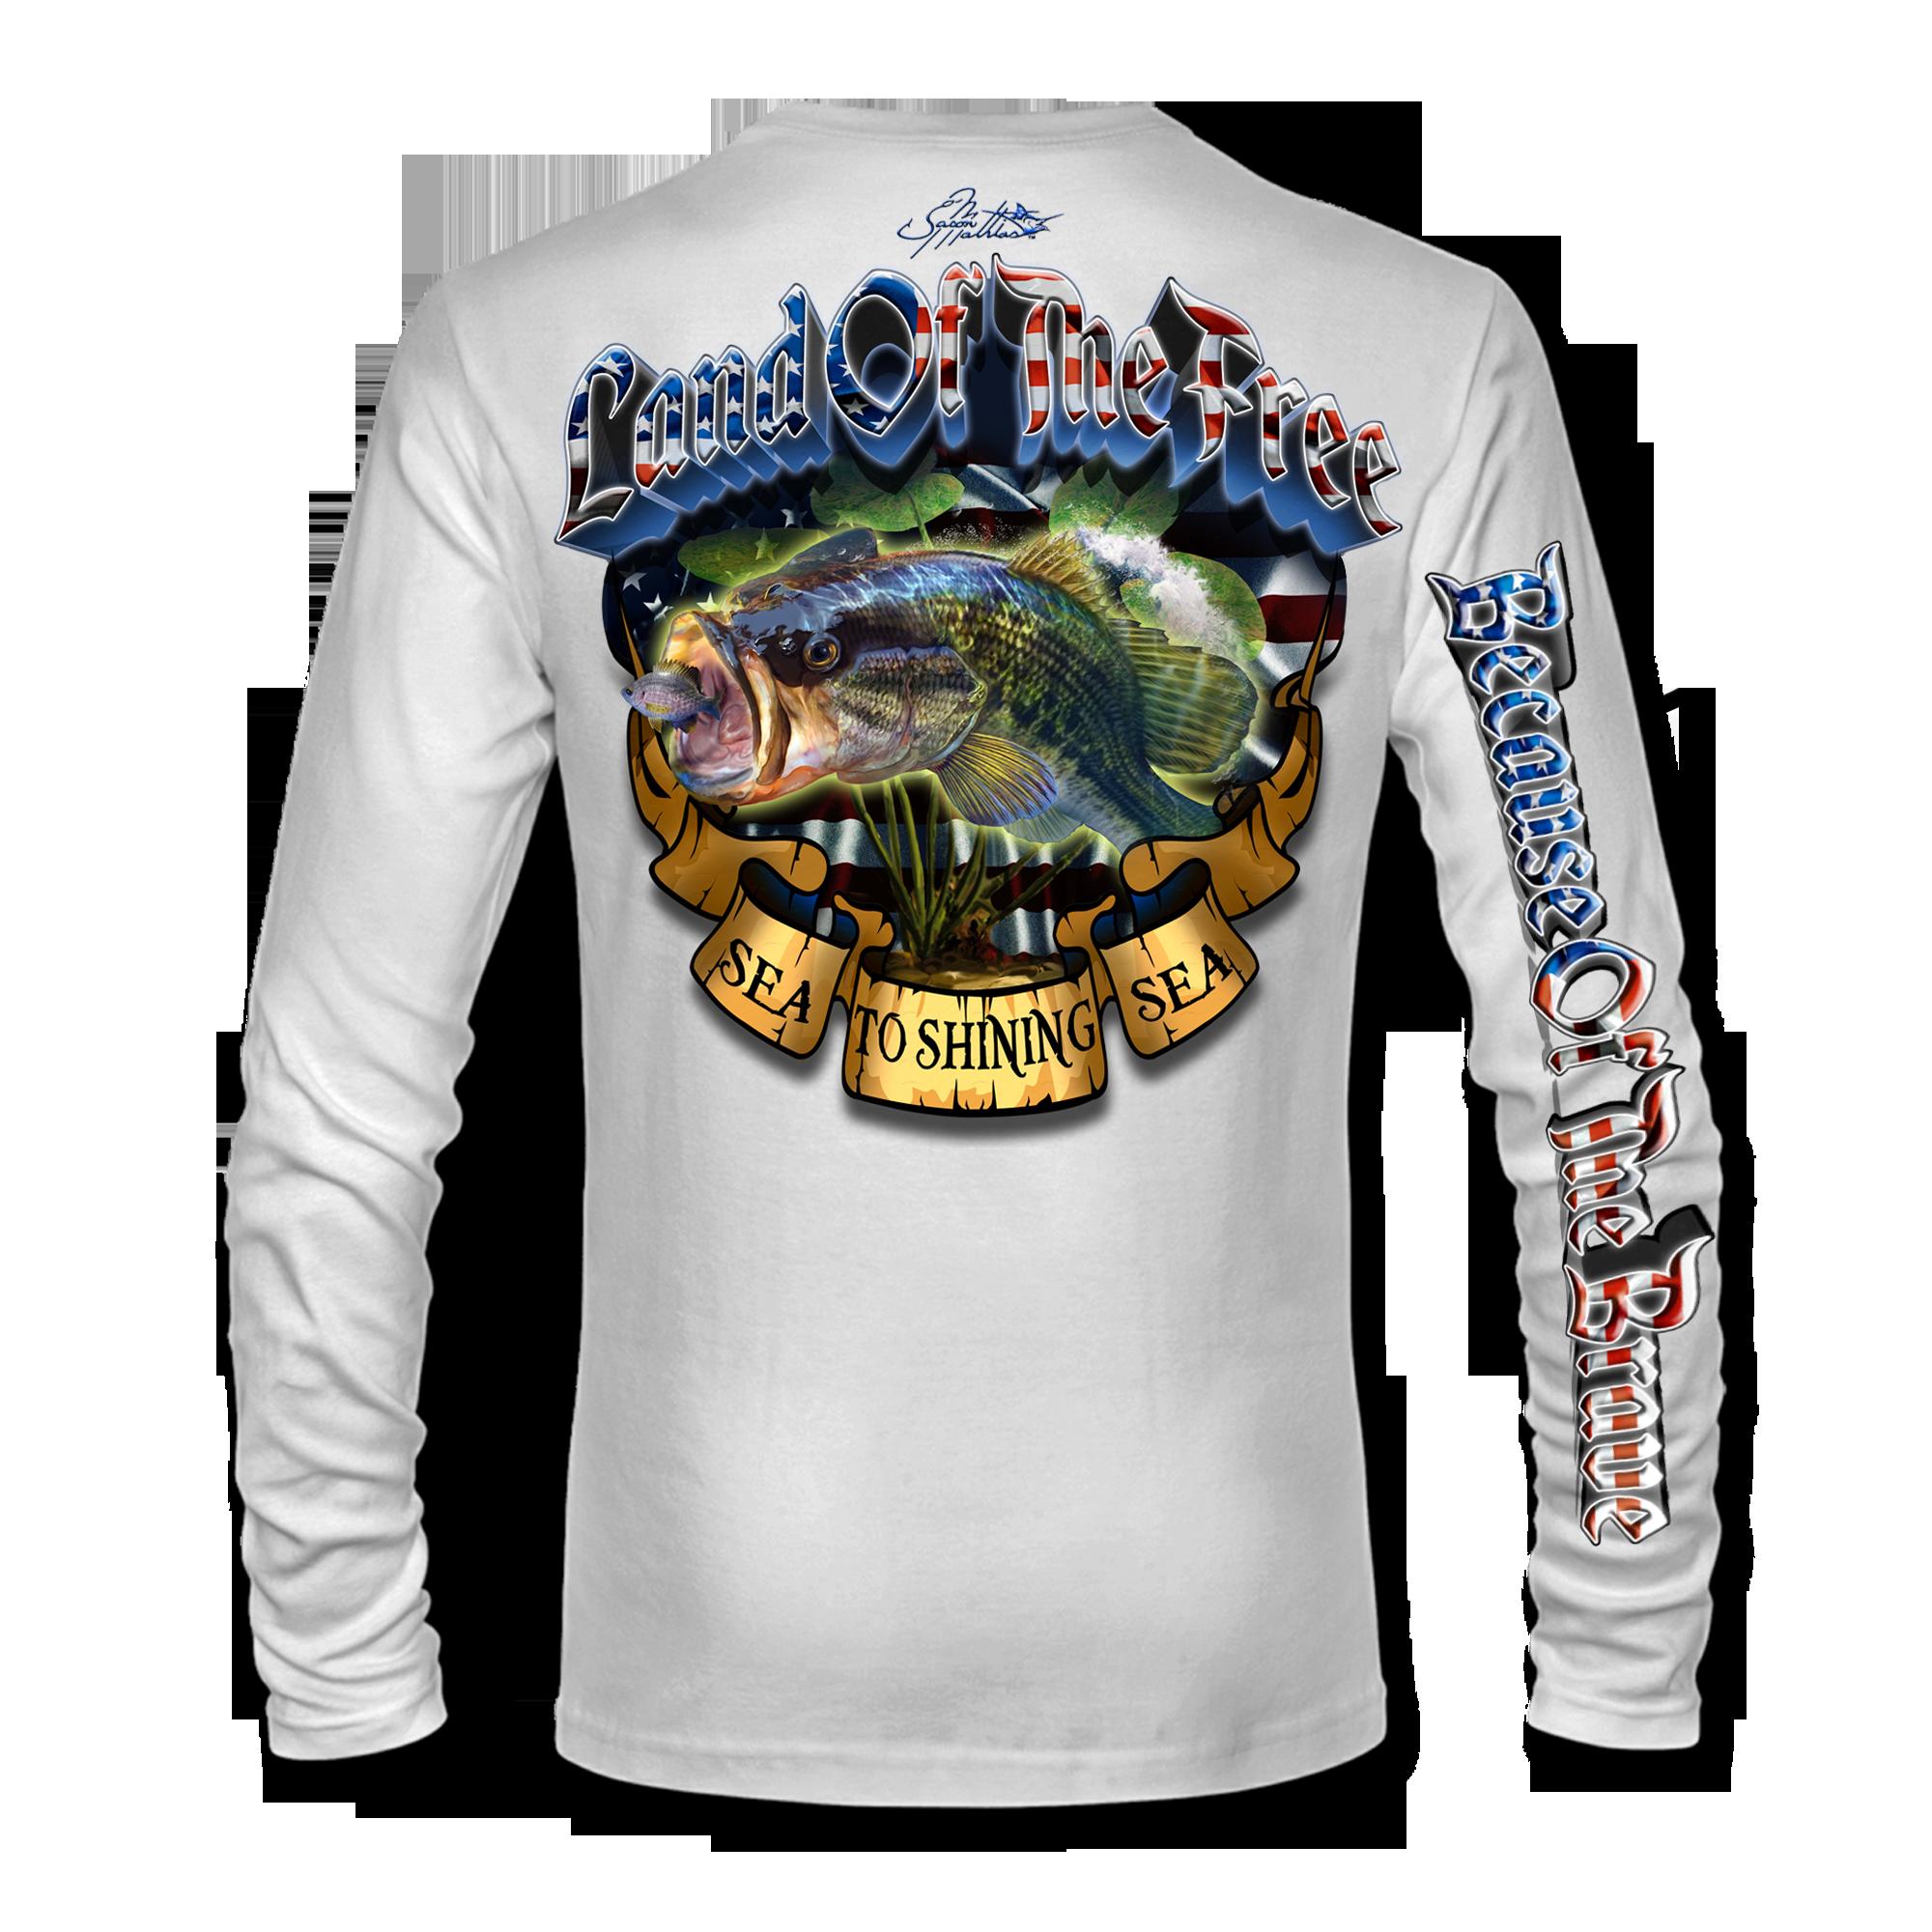 land-of-the-free-because-of-the-brave-sea-to-shining-sea-american-flag-patriotic-jason-mathias-art-shirt-bass-fishing-white.png